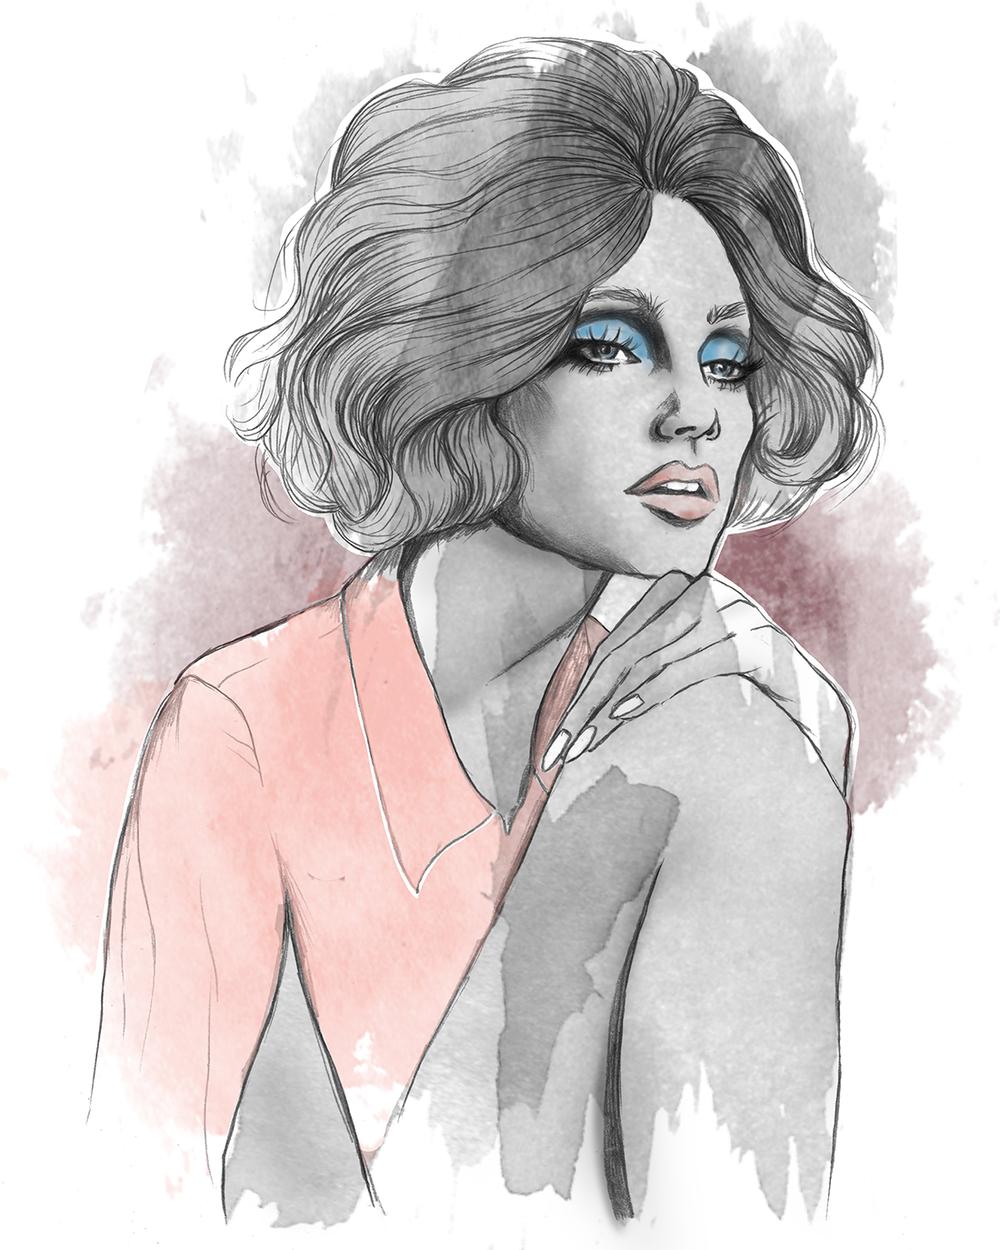 Inspired by Jessica Stam in W Magazine